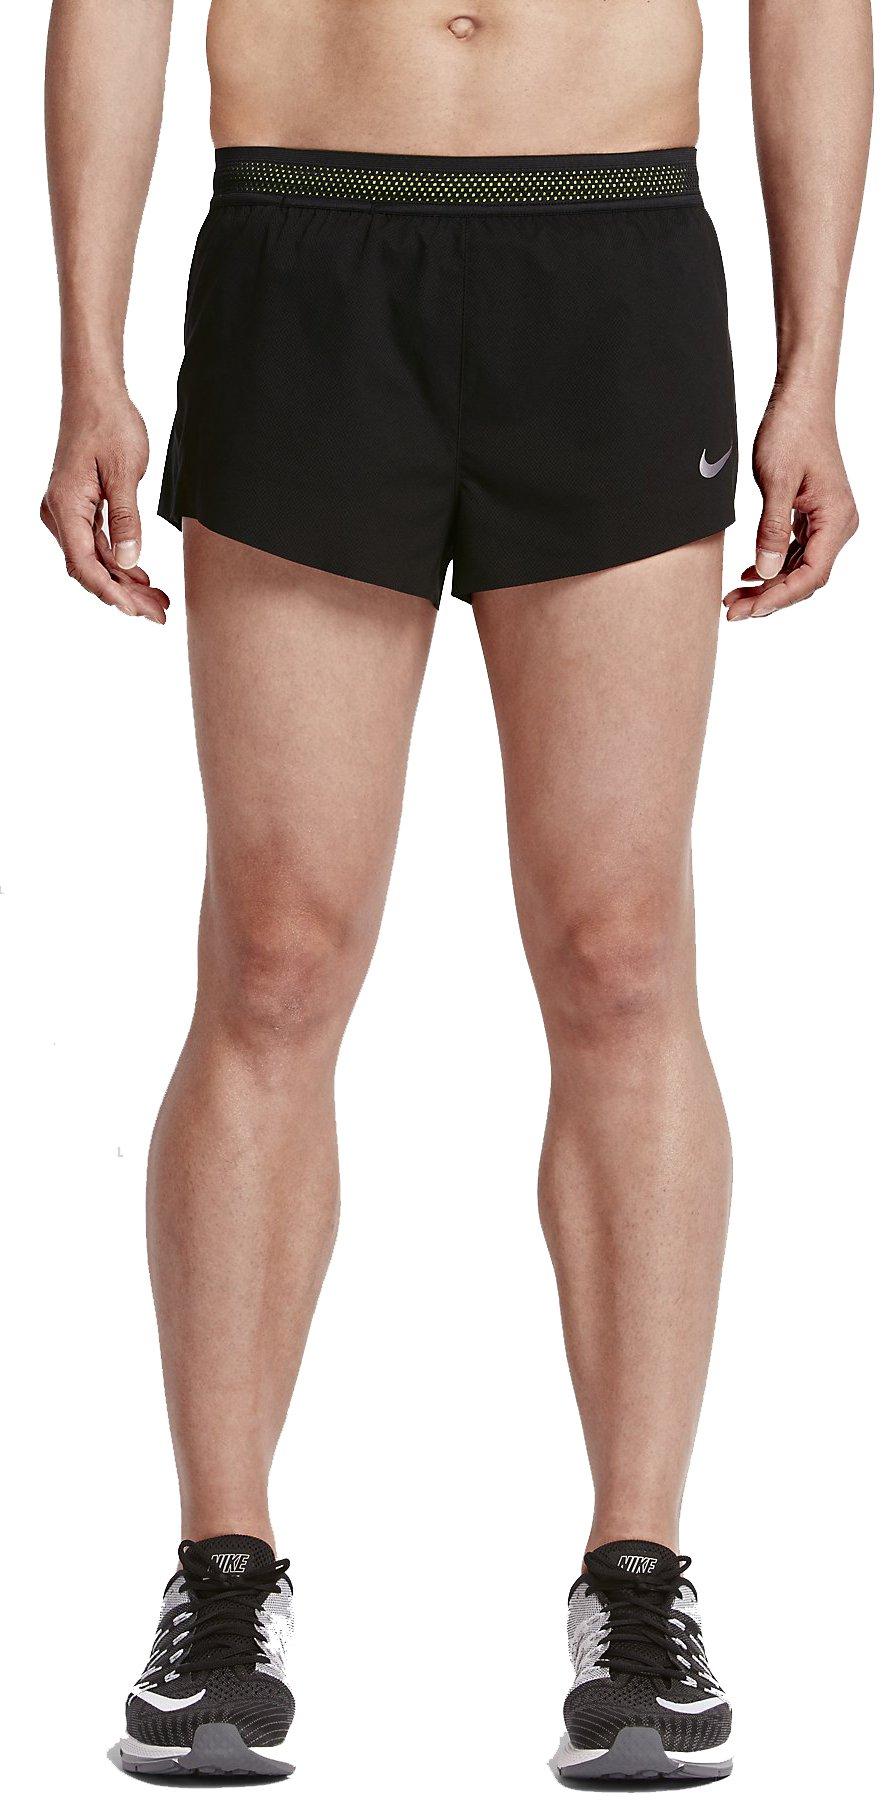 "Běžecké šortky Nike Aeroswift 2"""